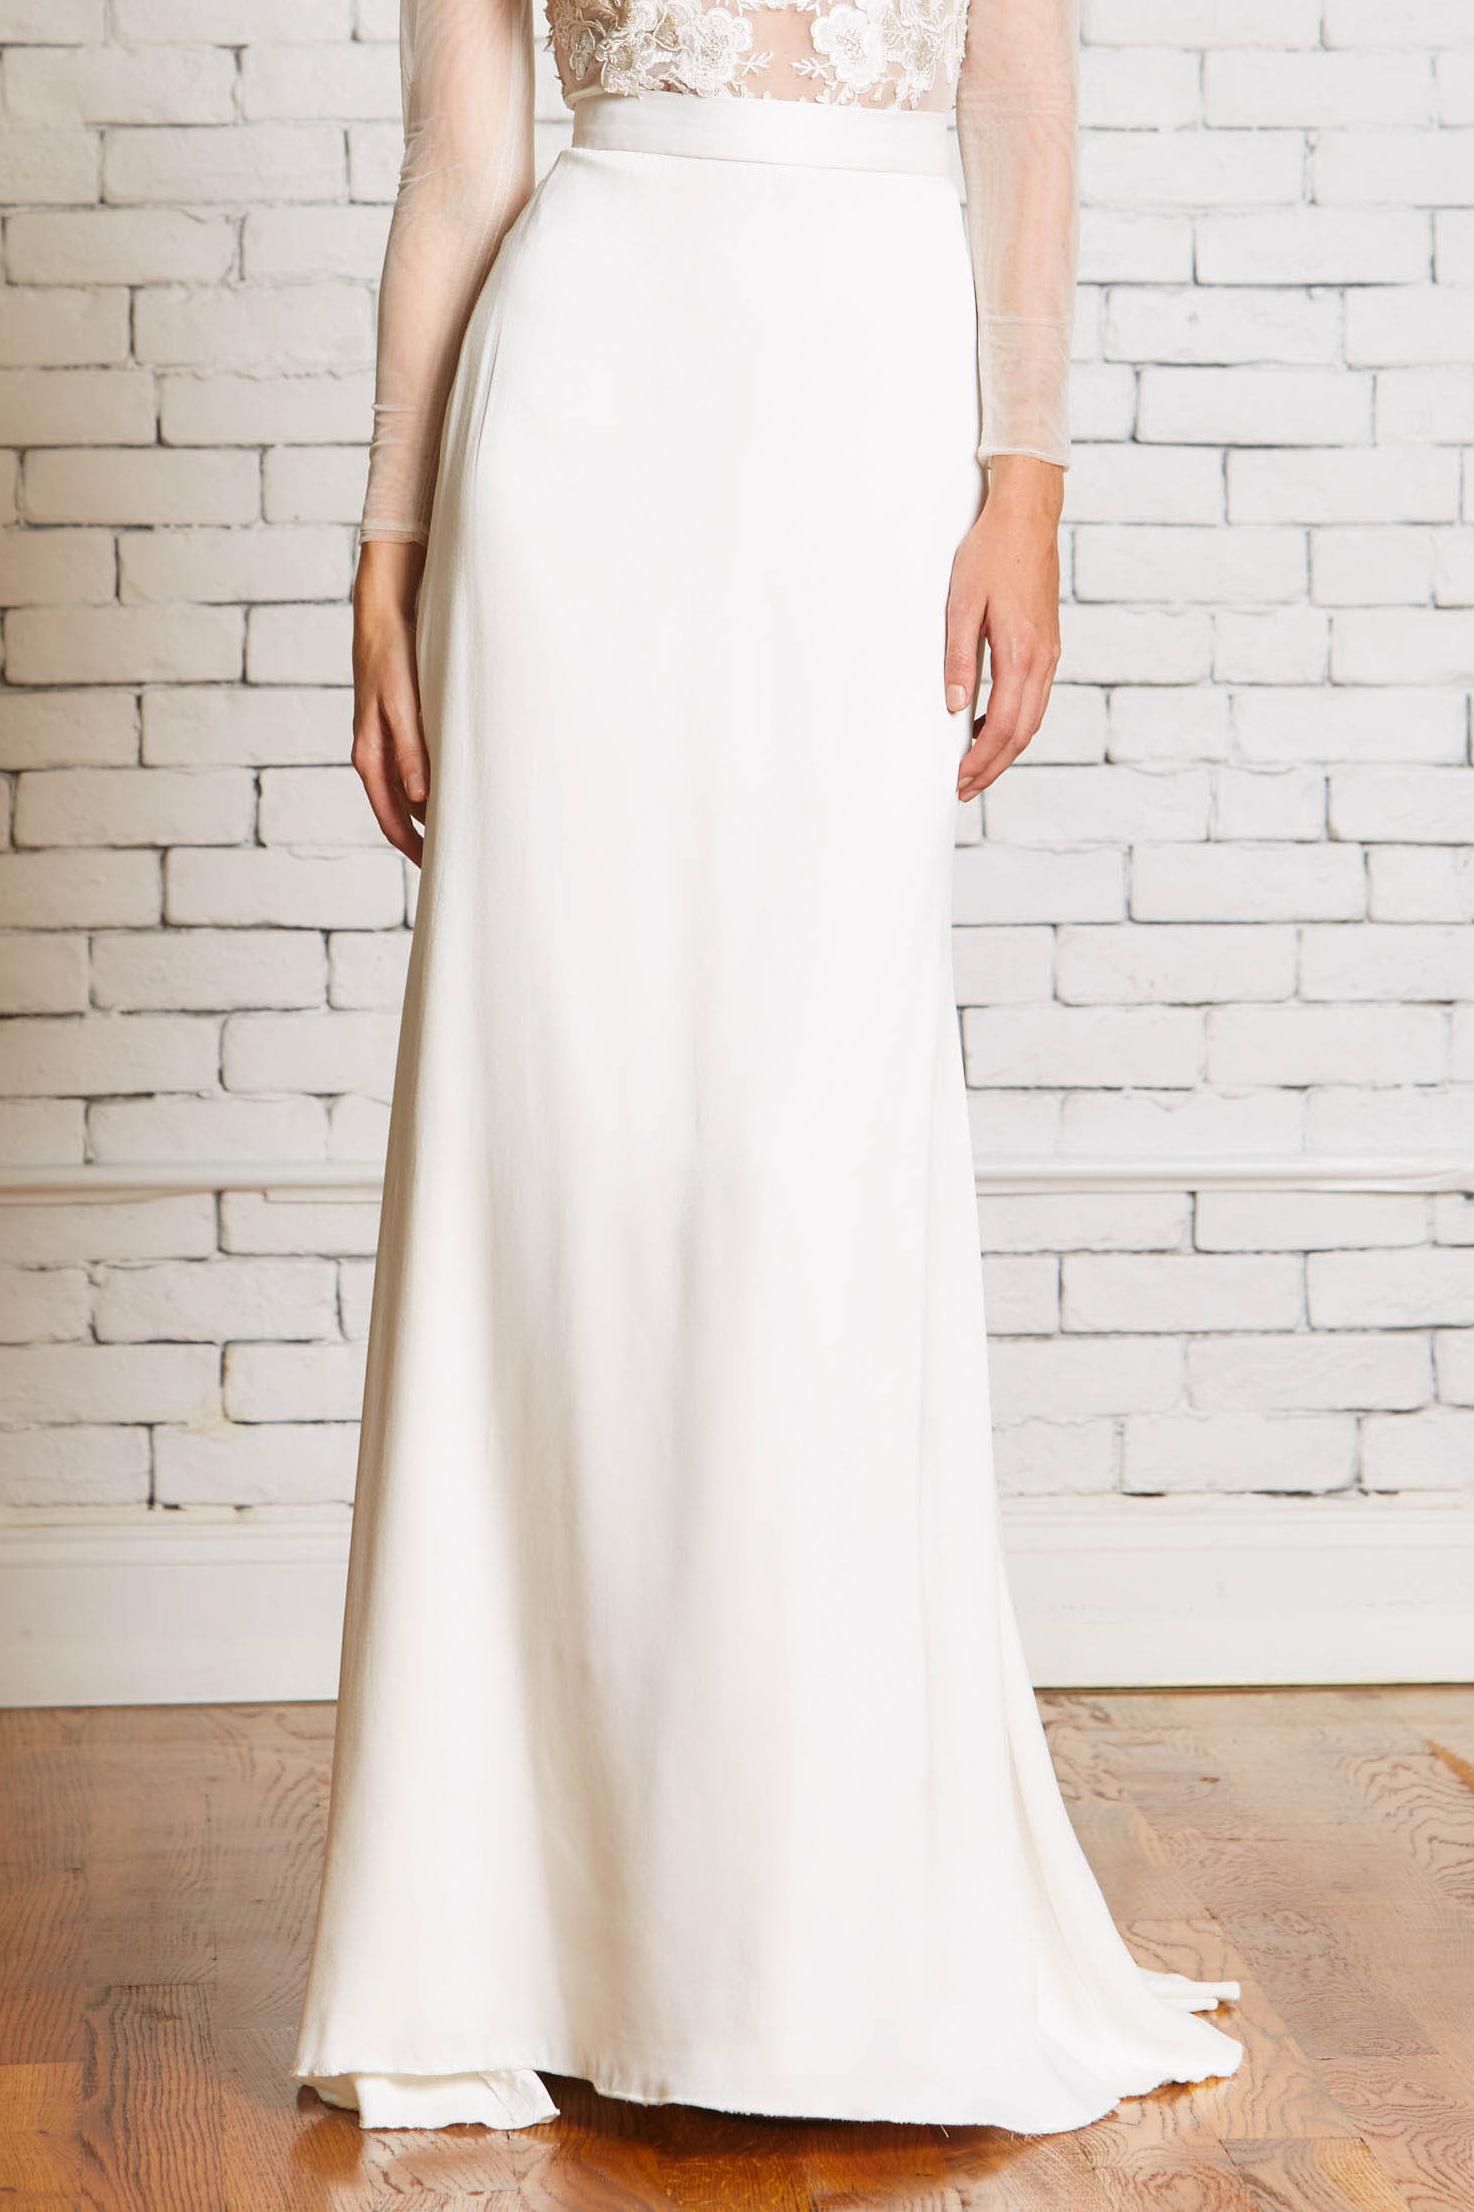 Alma_Skirt_Front_Minimal_Bridal_Skirt_Rebecca_Schoneveld_Sexy_Modern_wedding_Dress copy.jpg